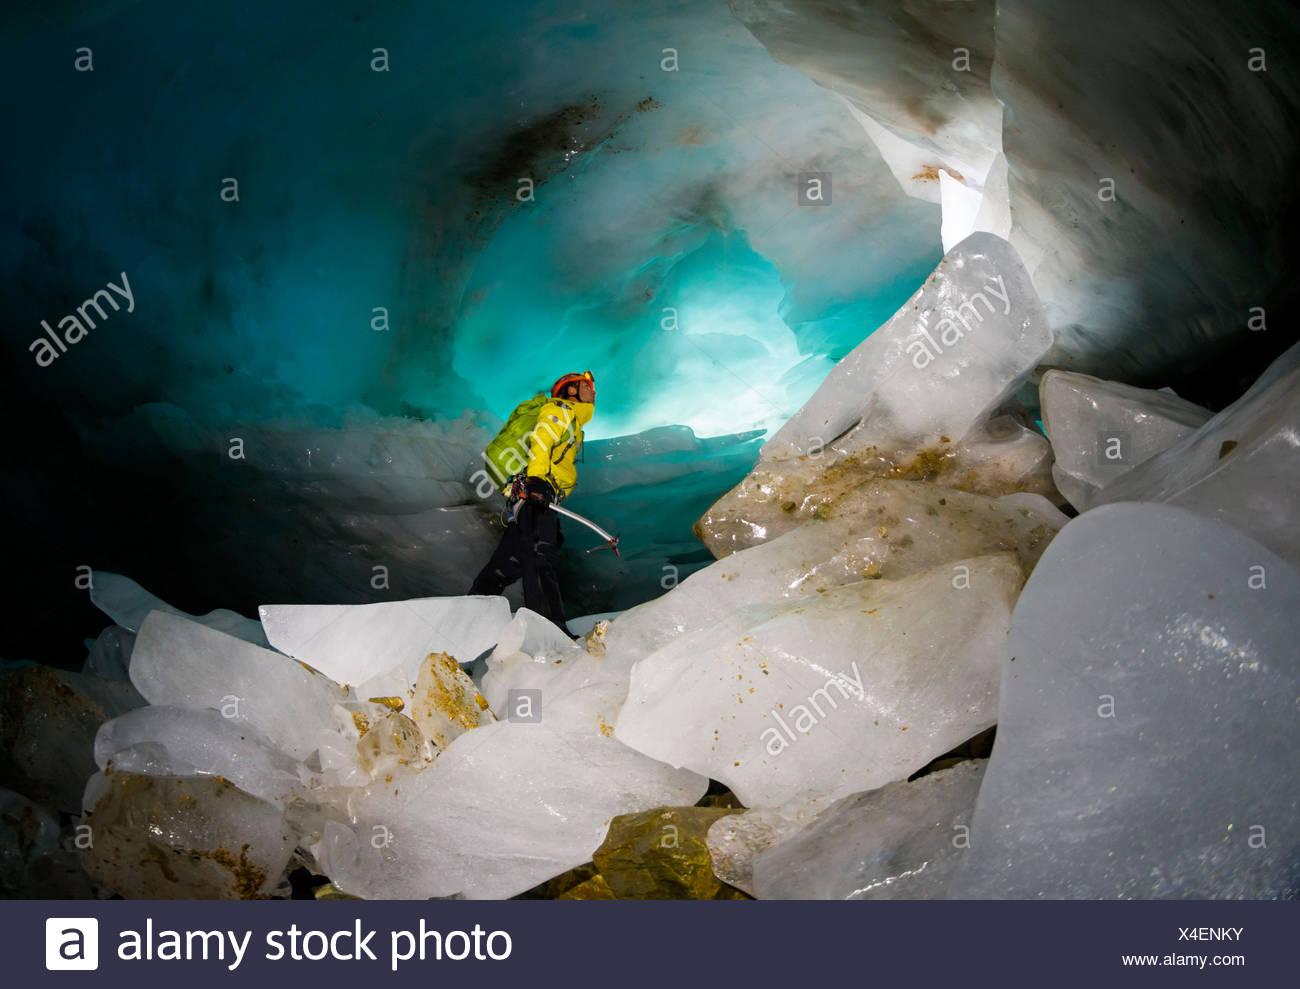 Ice cave, Paradisin glacier, Livigno Valley, Lombardy, Italy - Stock Image